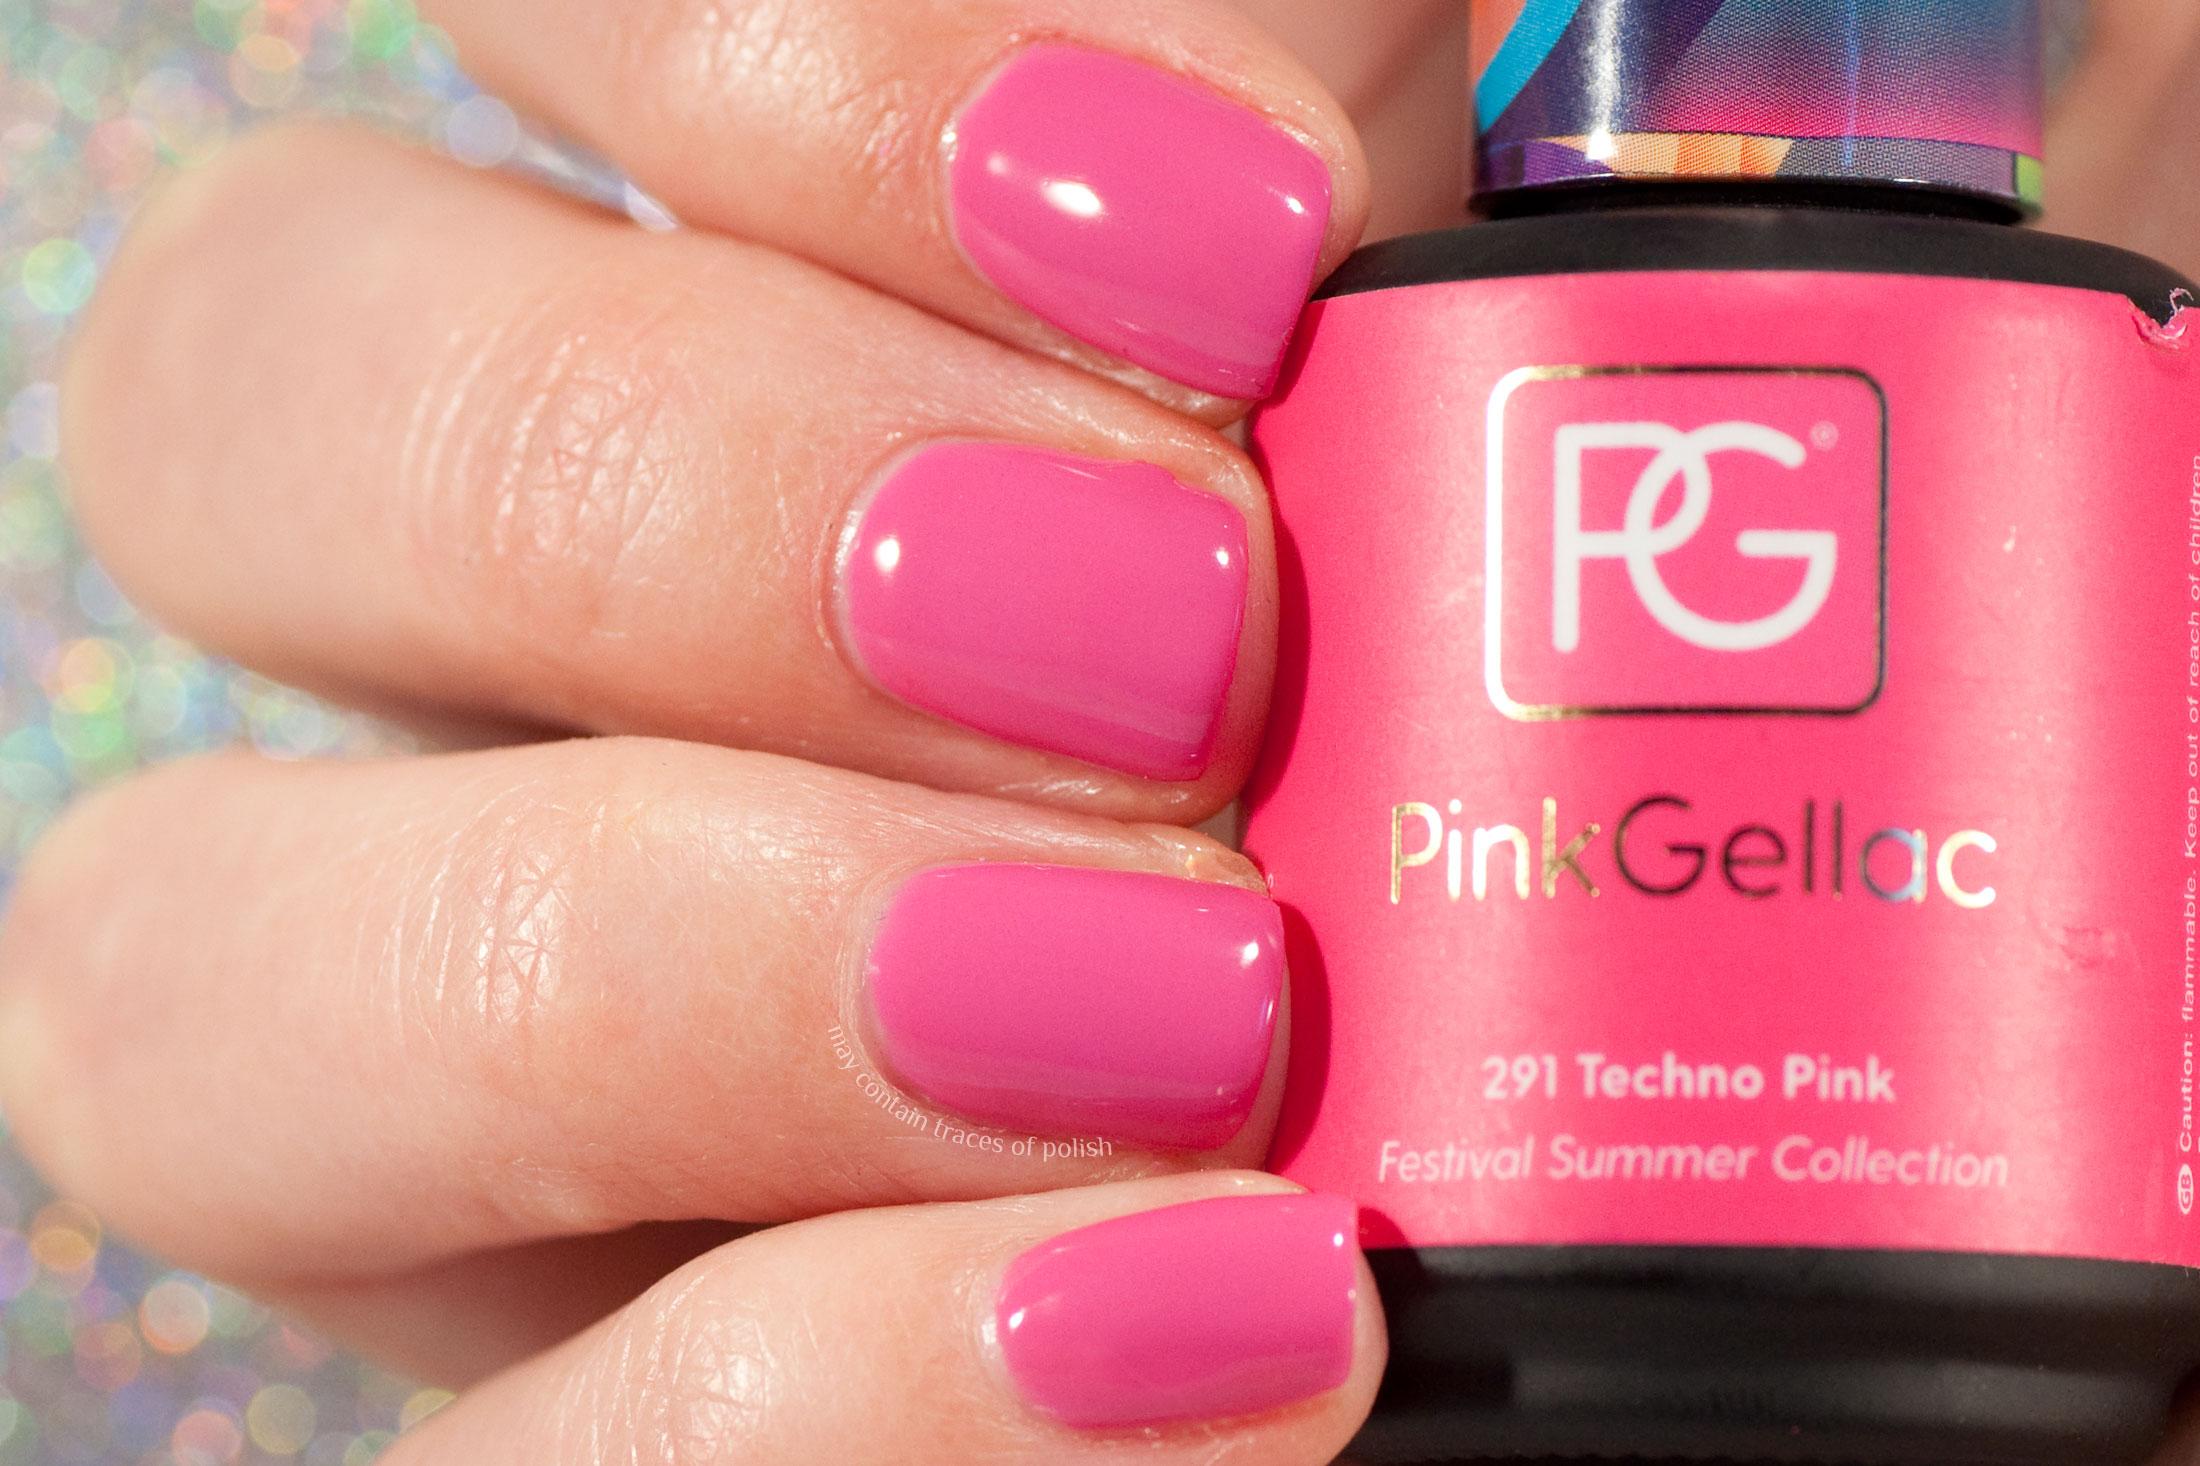 Pink Gellac 291 Techno Pink